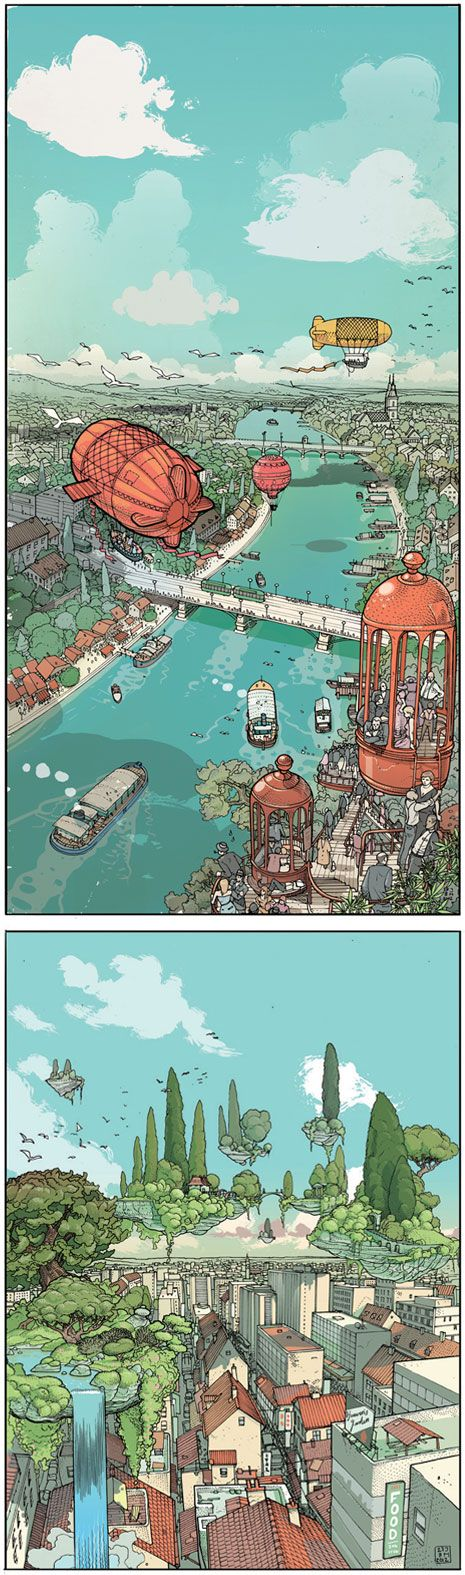 Jared illustrations tageszeitung_aug_2012